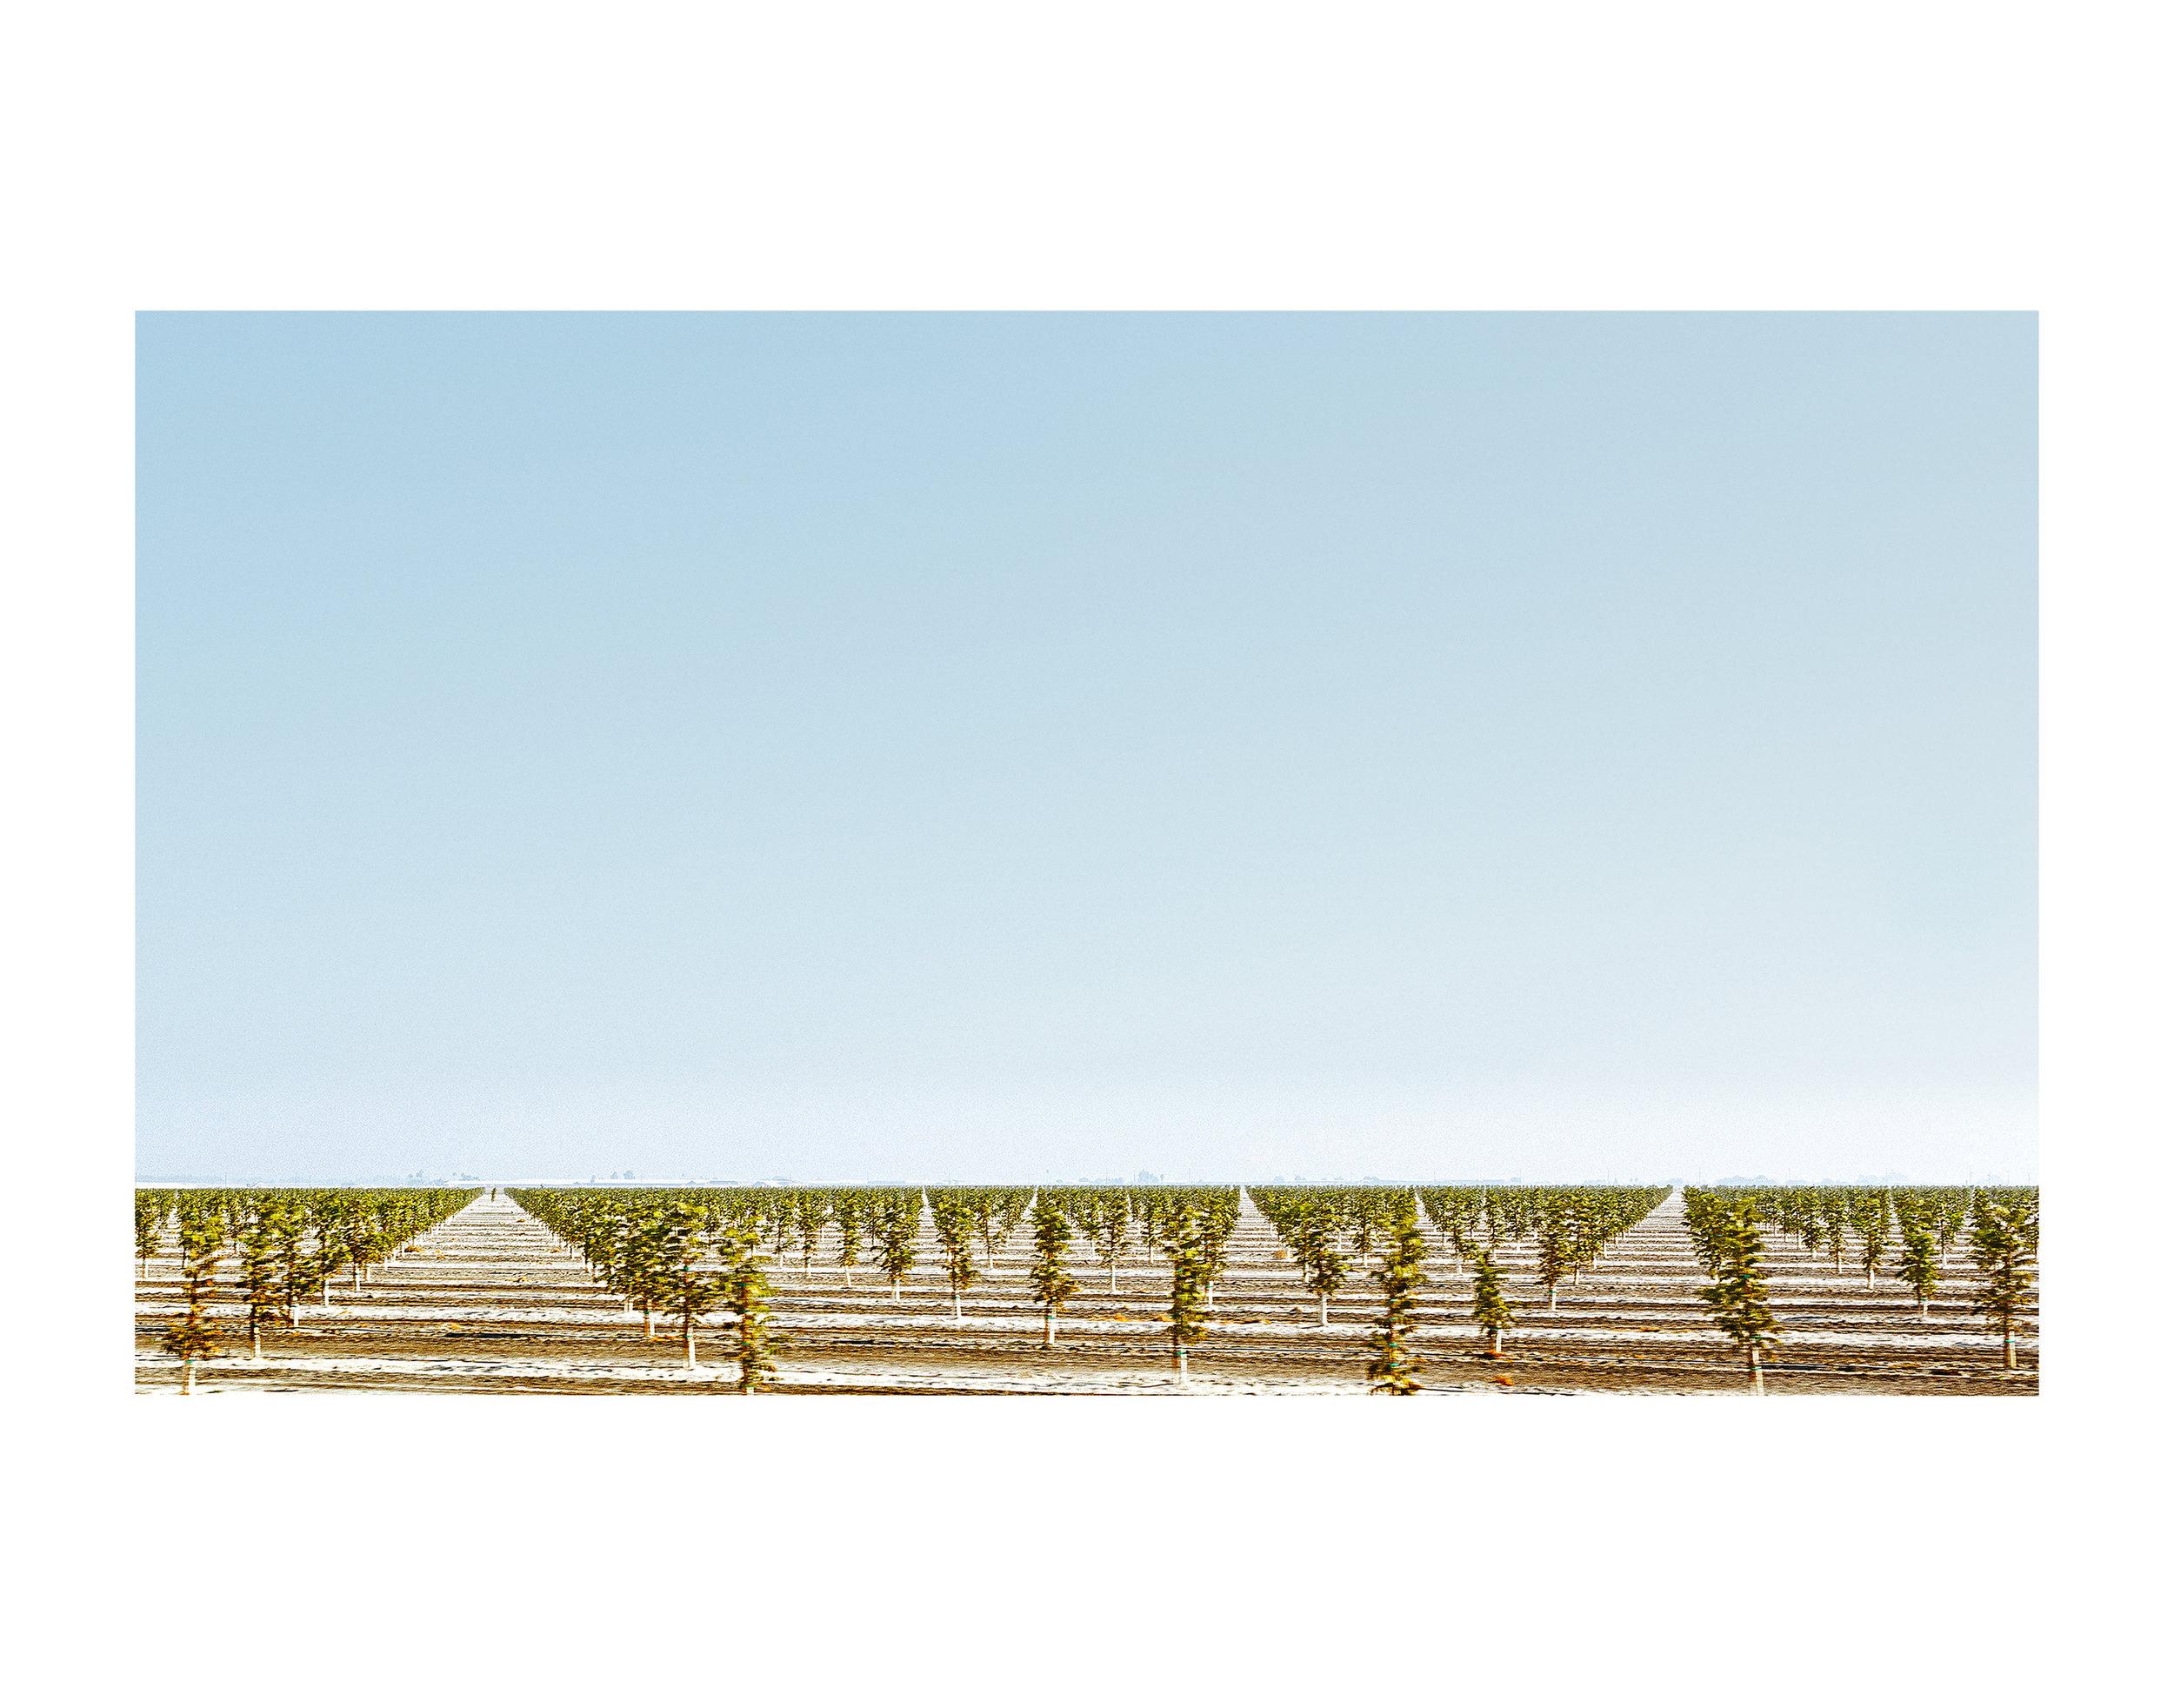 Graphic Vineyard, Central; 2014